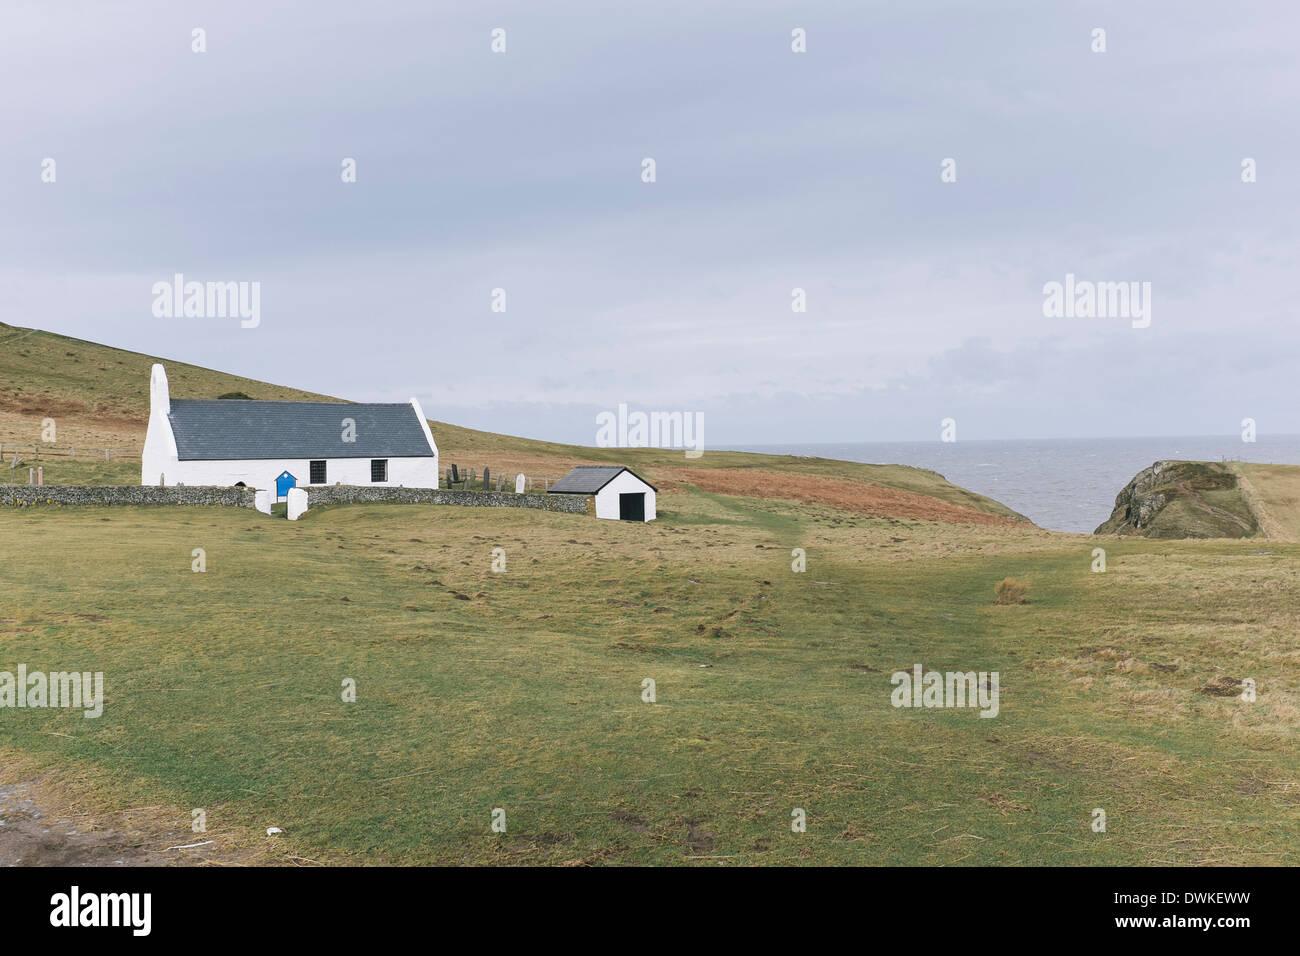 Mwnt church, Cardigan Bay. - Stock Image